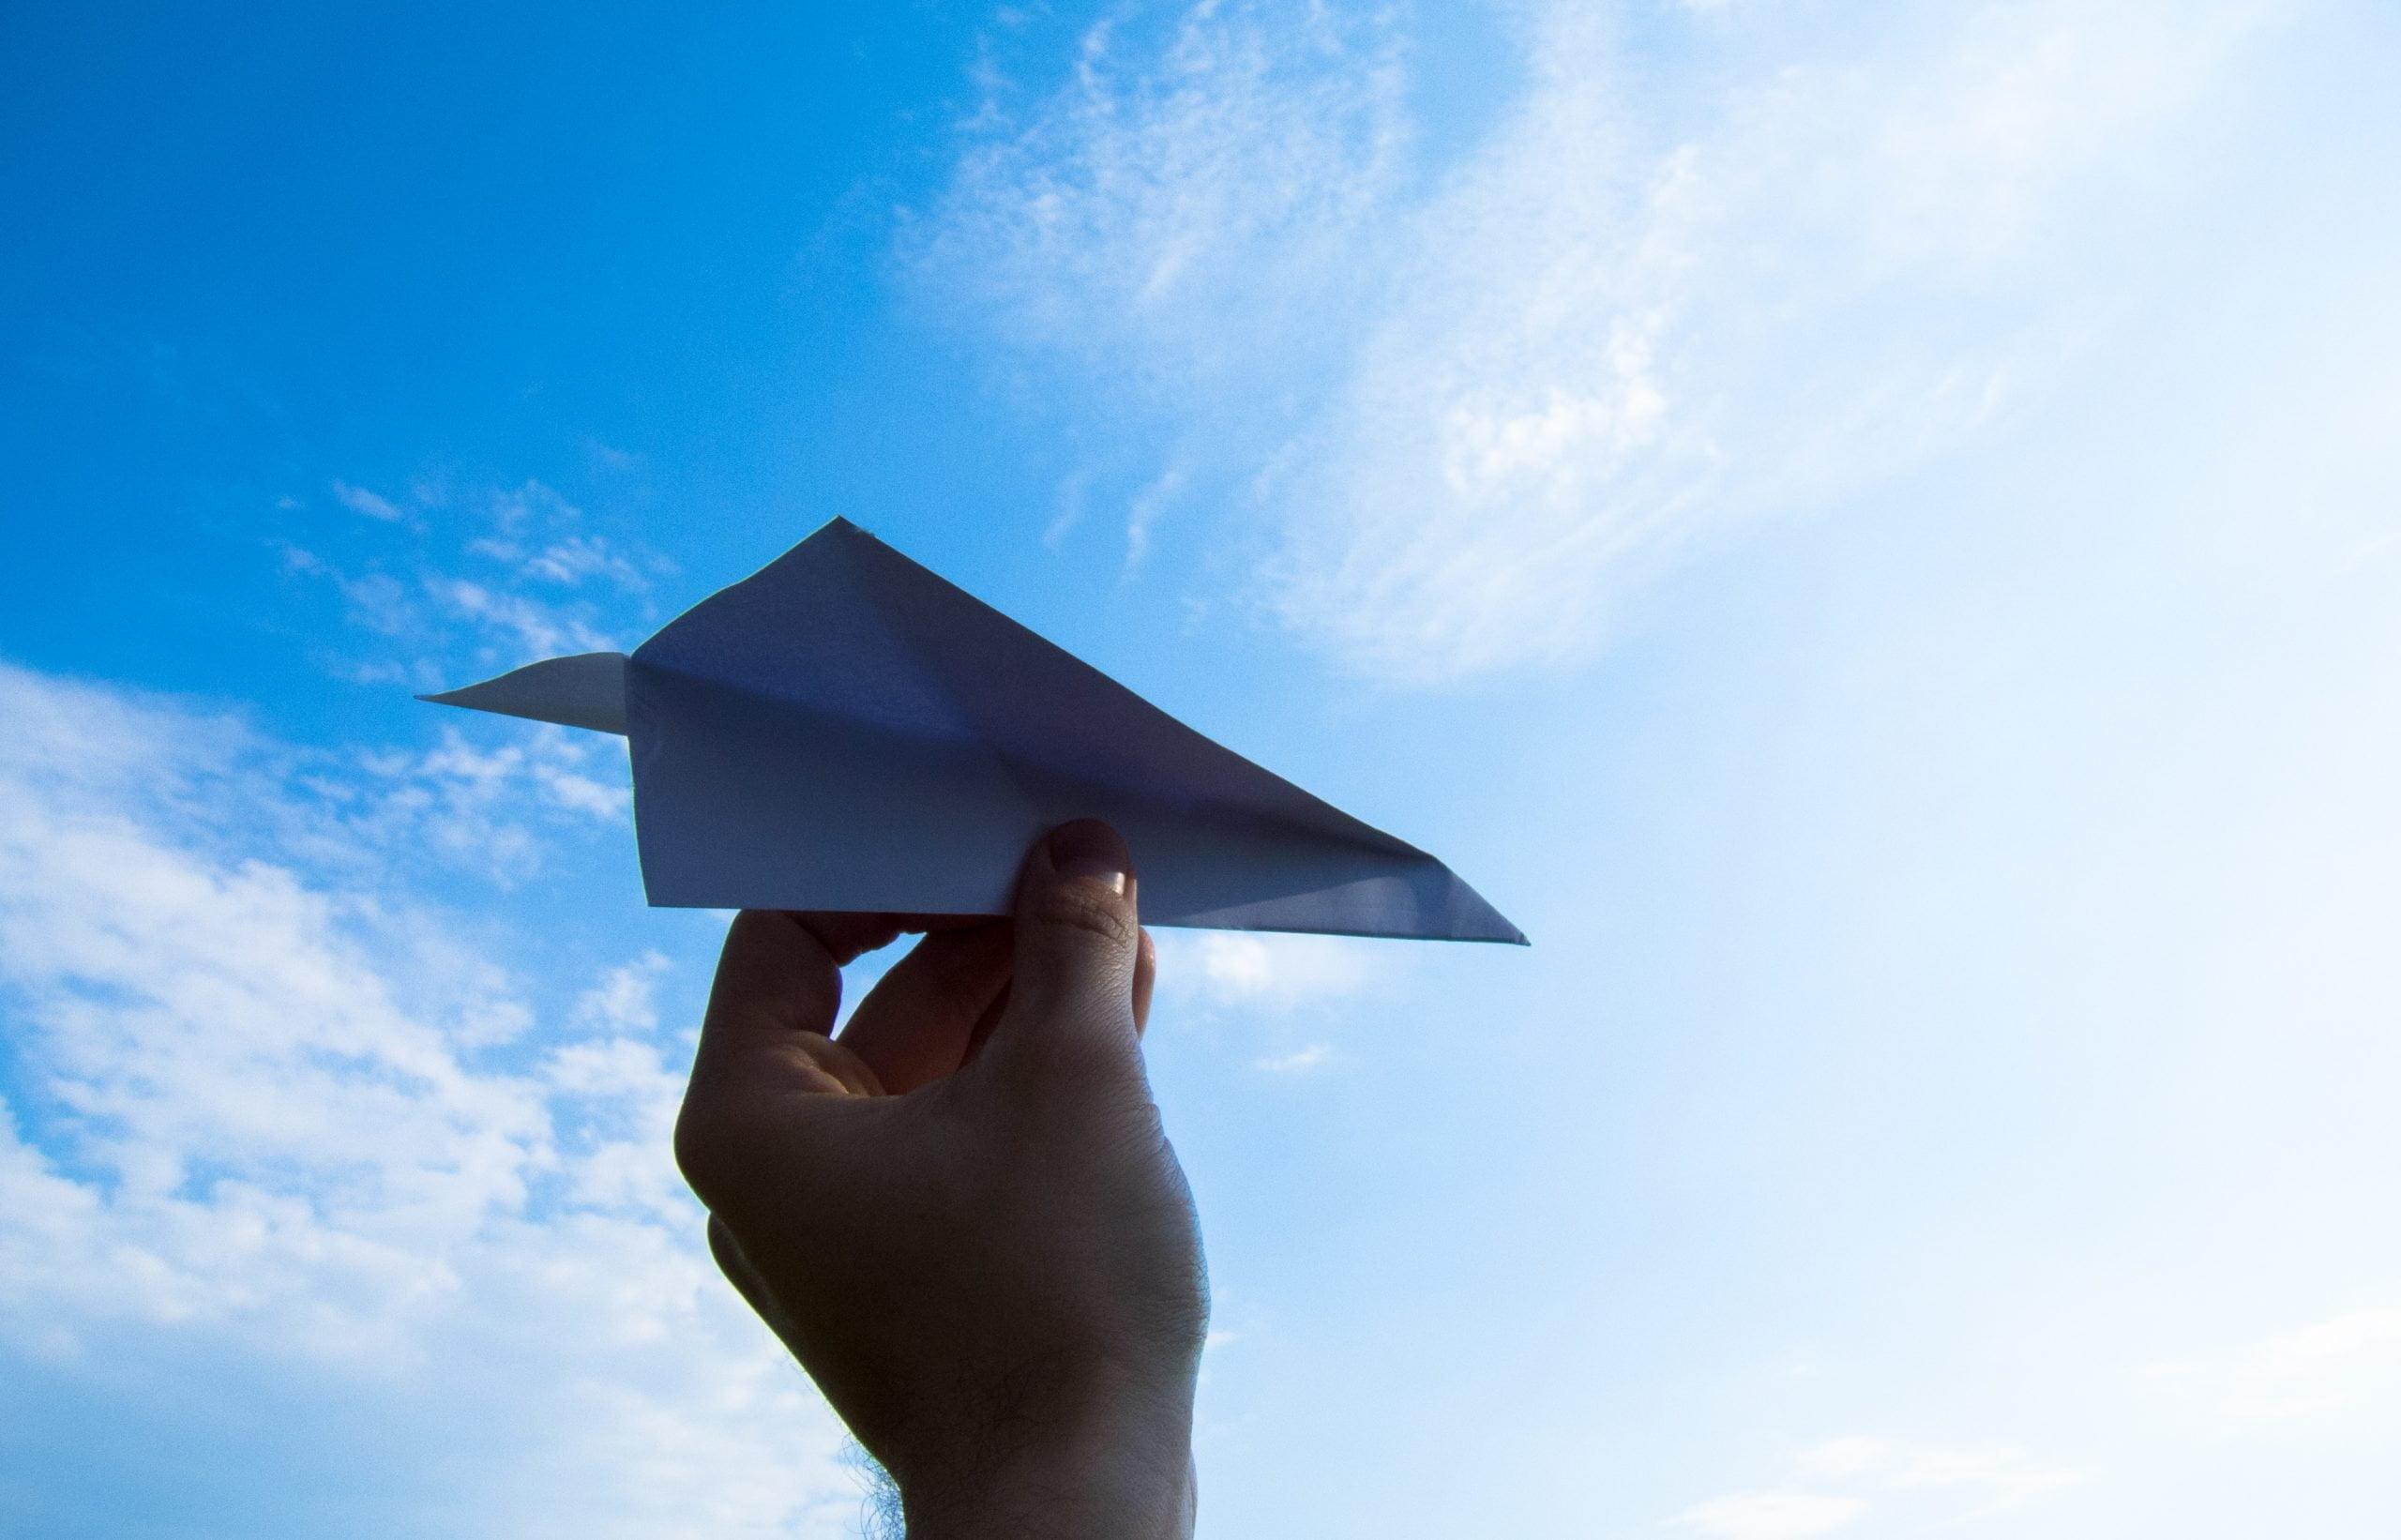 paper plane, the hand, sky